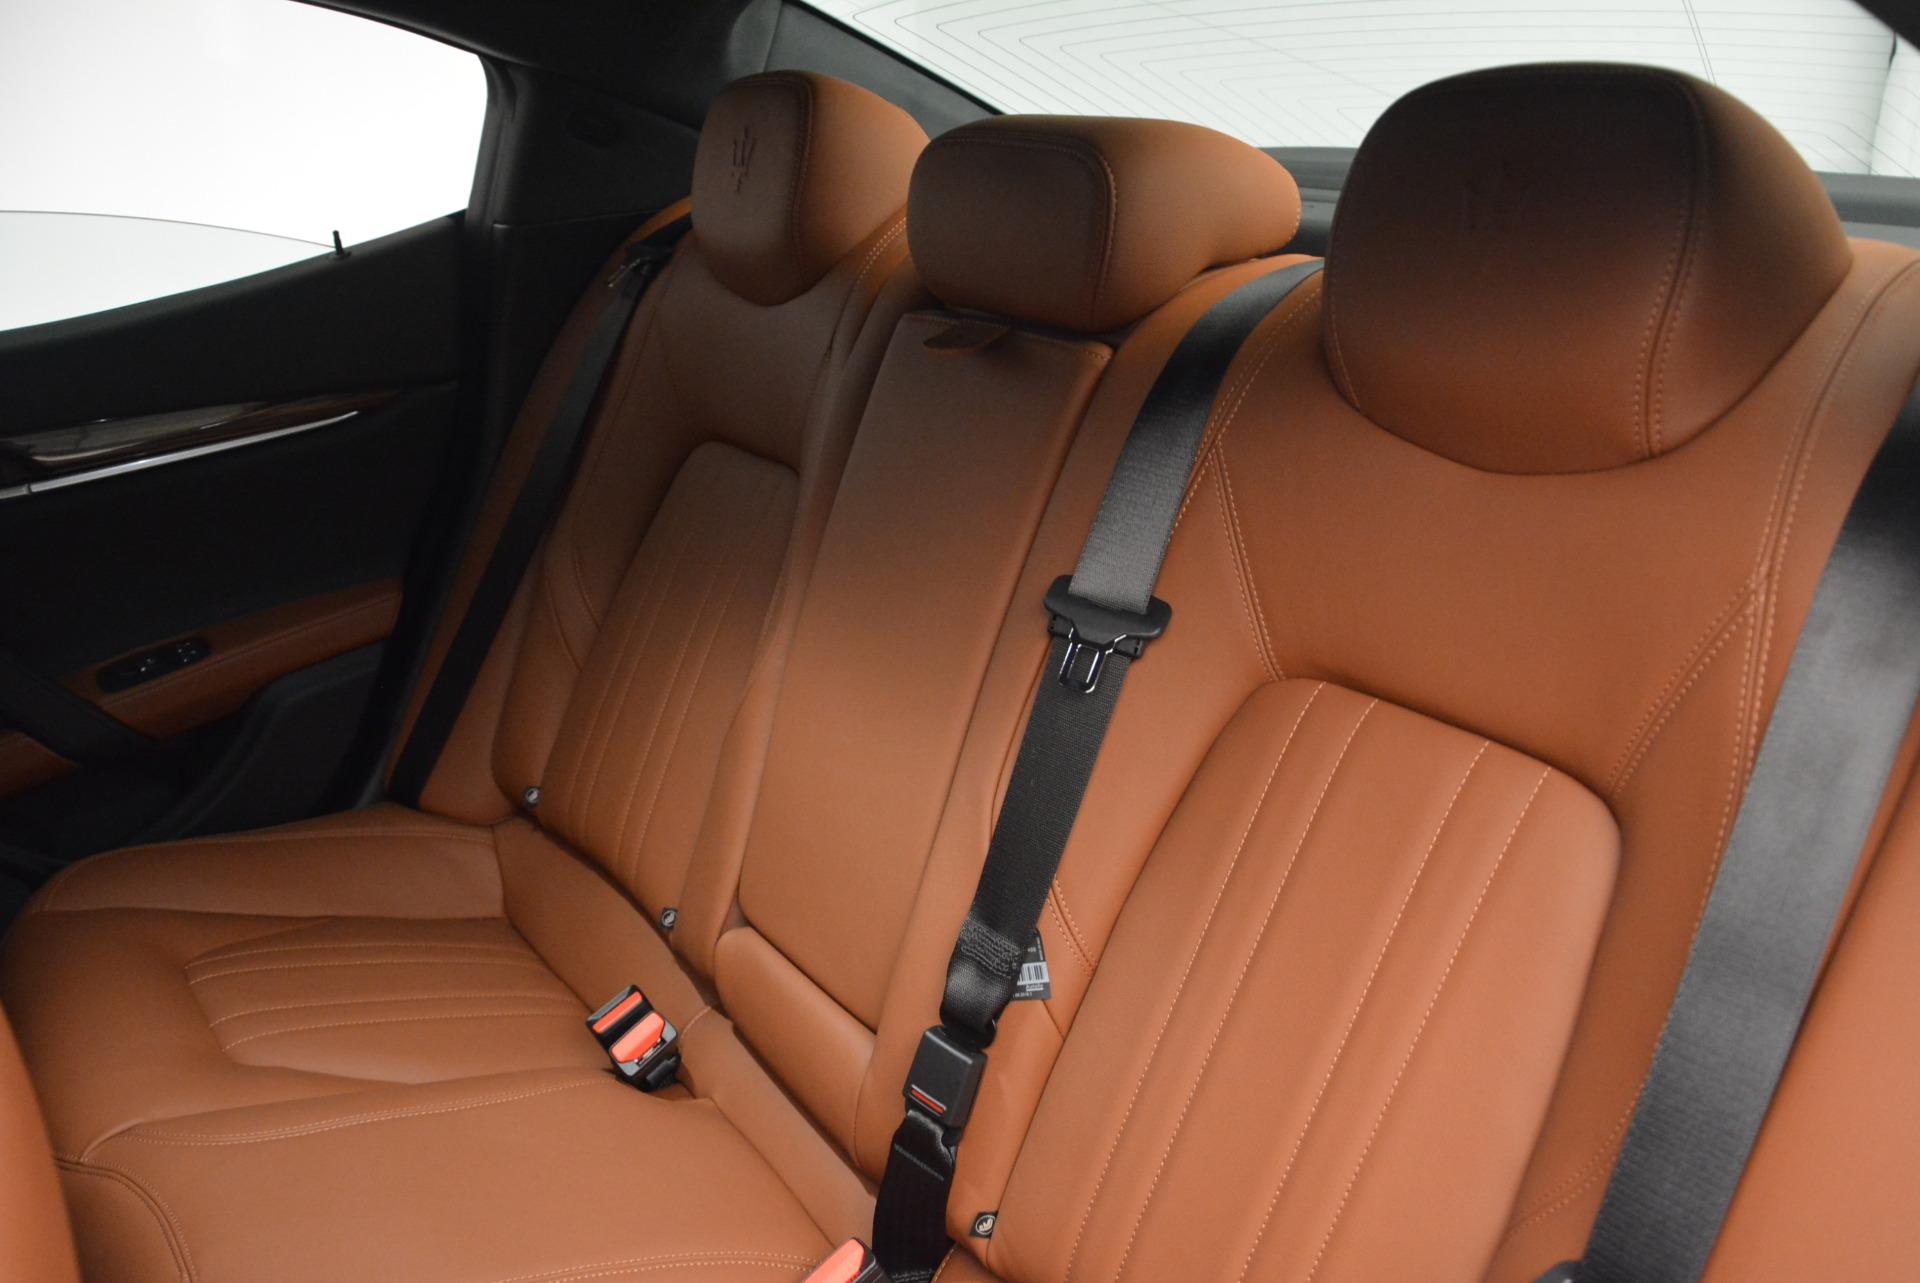 Used 2018 Maserati Ghibli S Q4 For Sale In Greenwich, CT 1566_p16